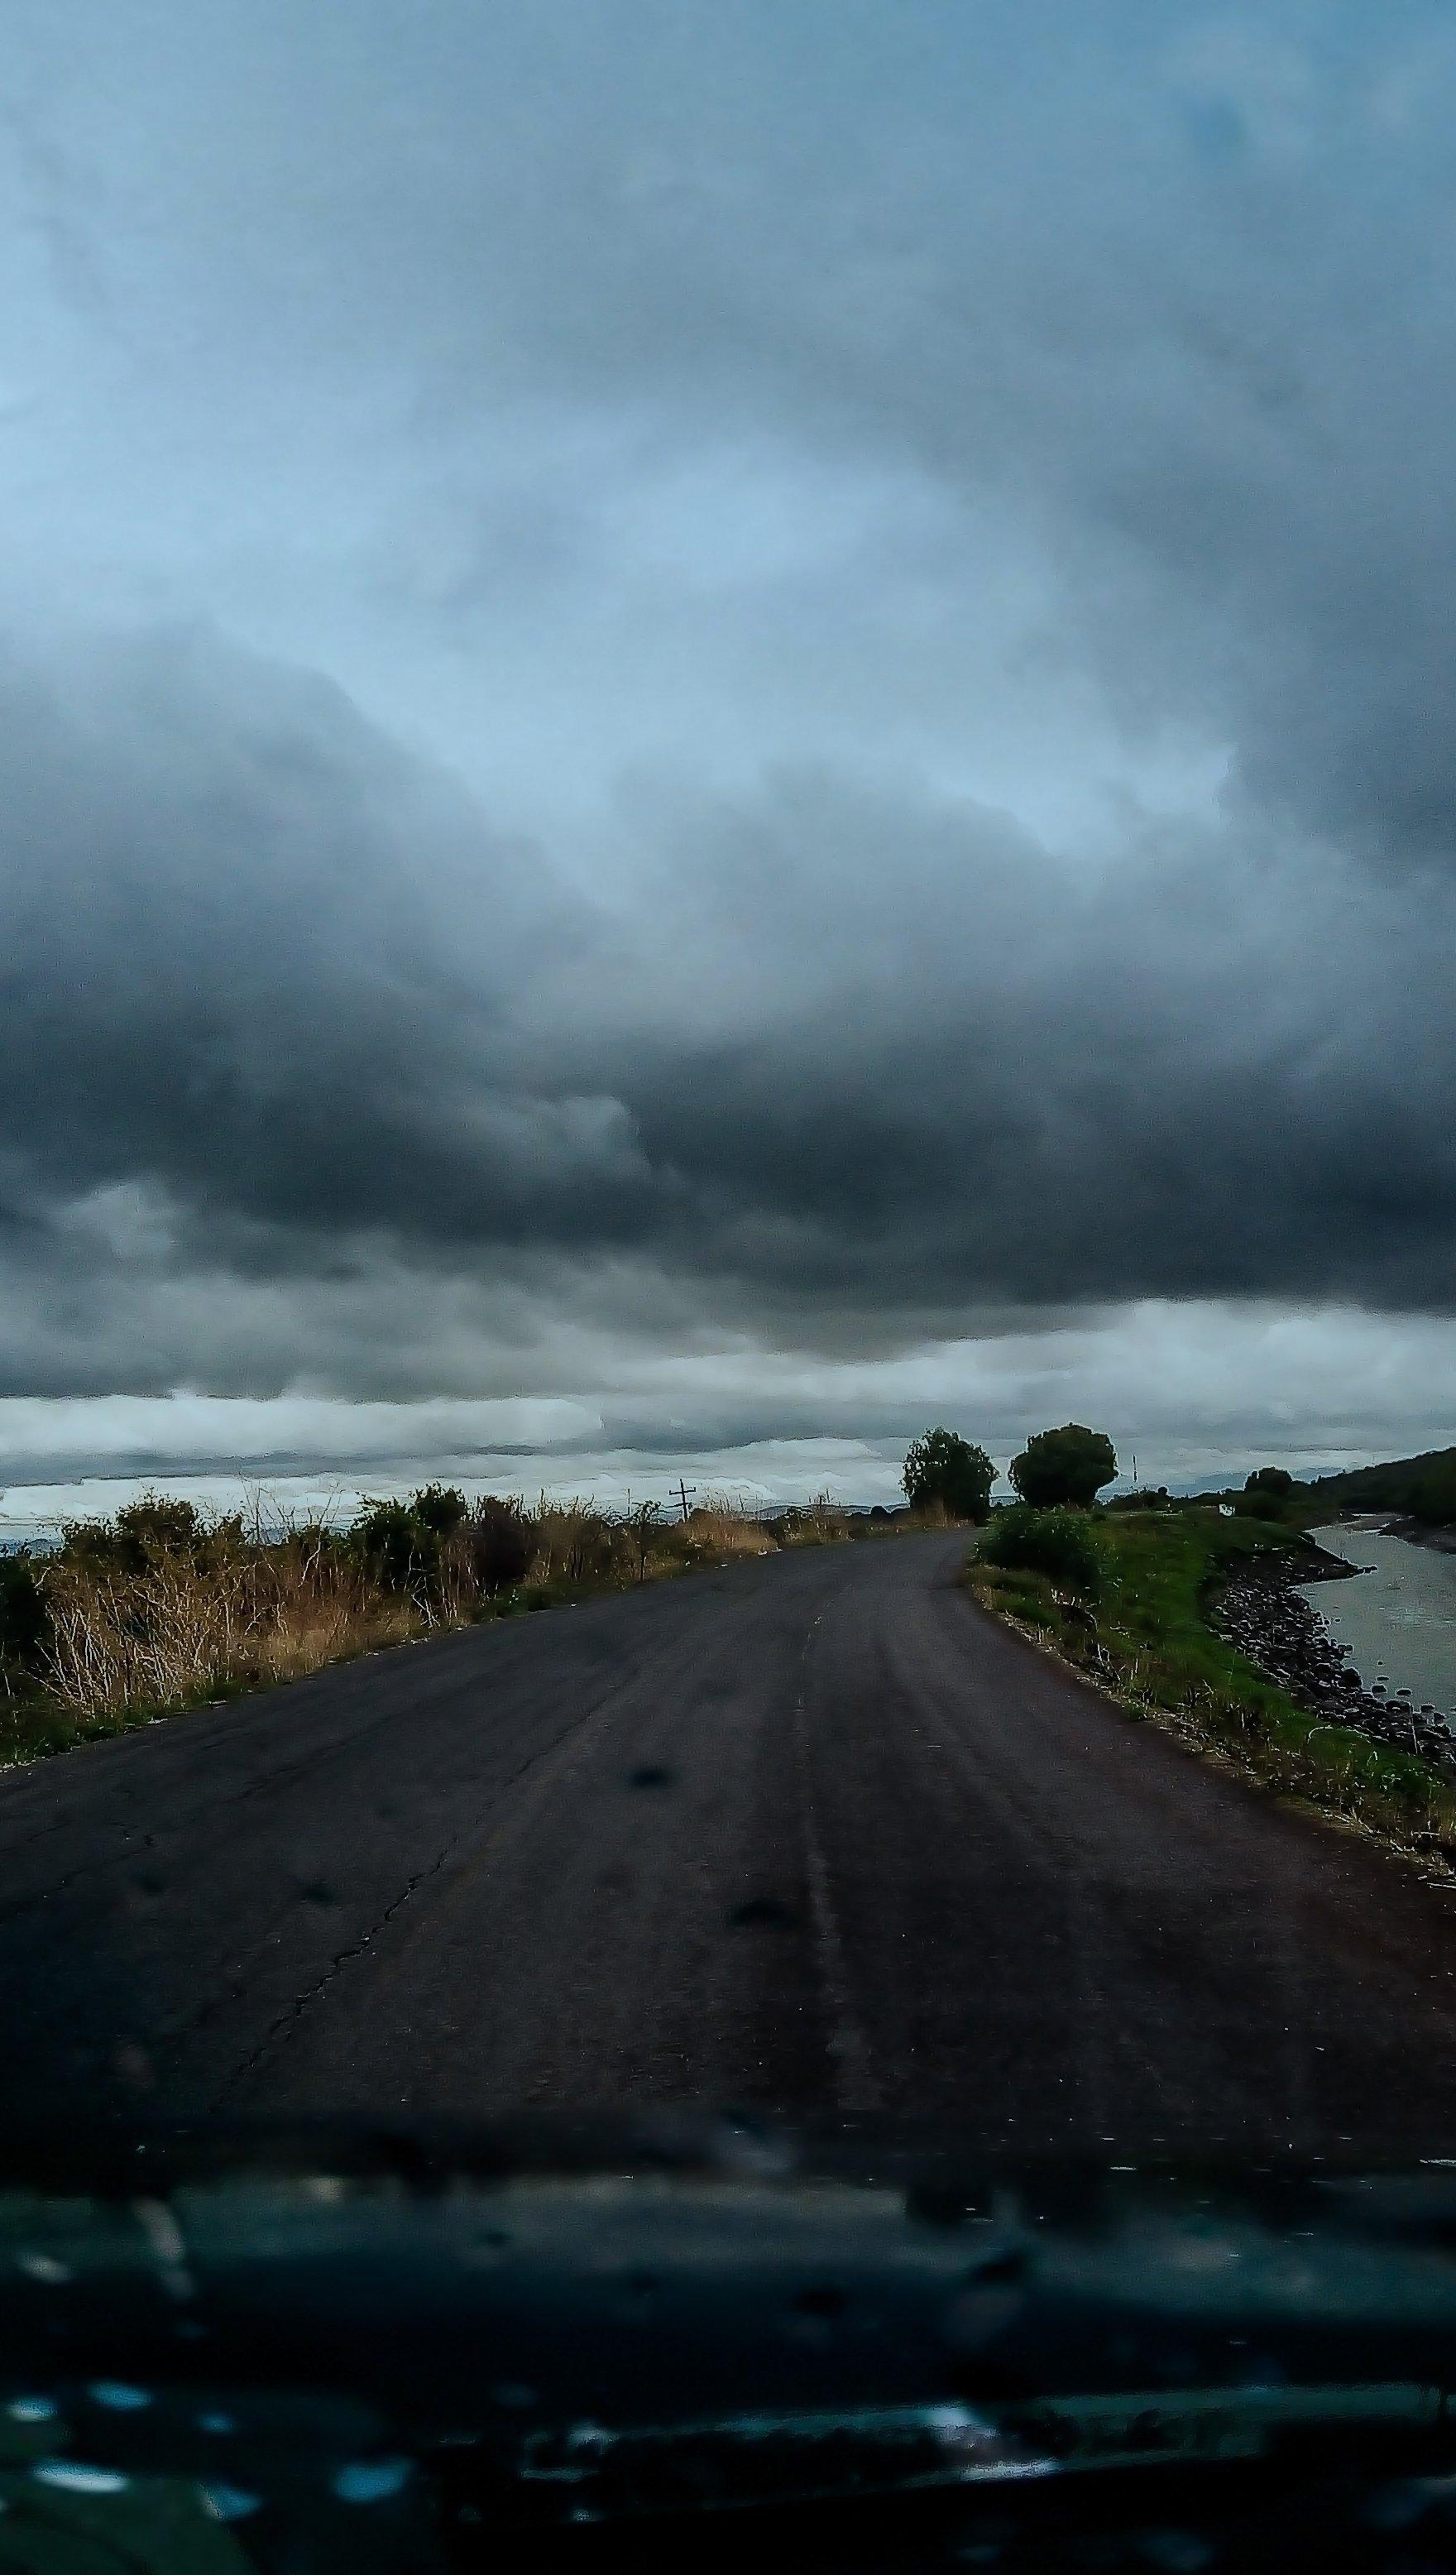 Fondos de pantalla Carretera clima nublado Vertical